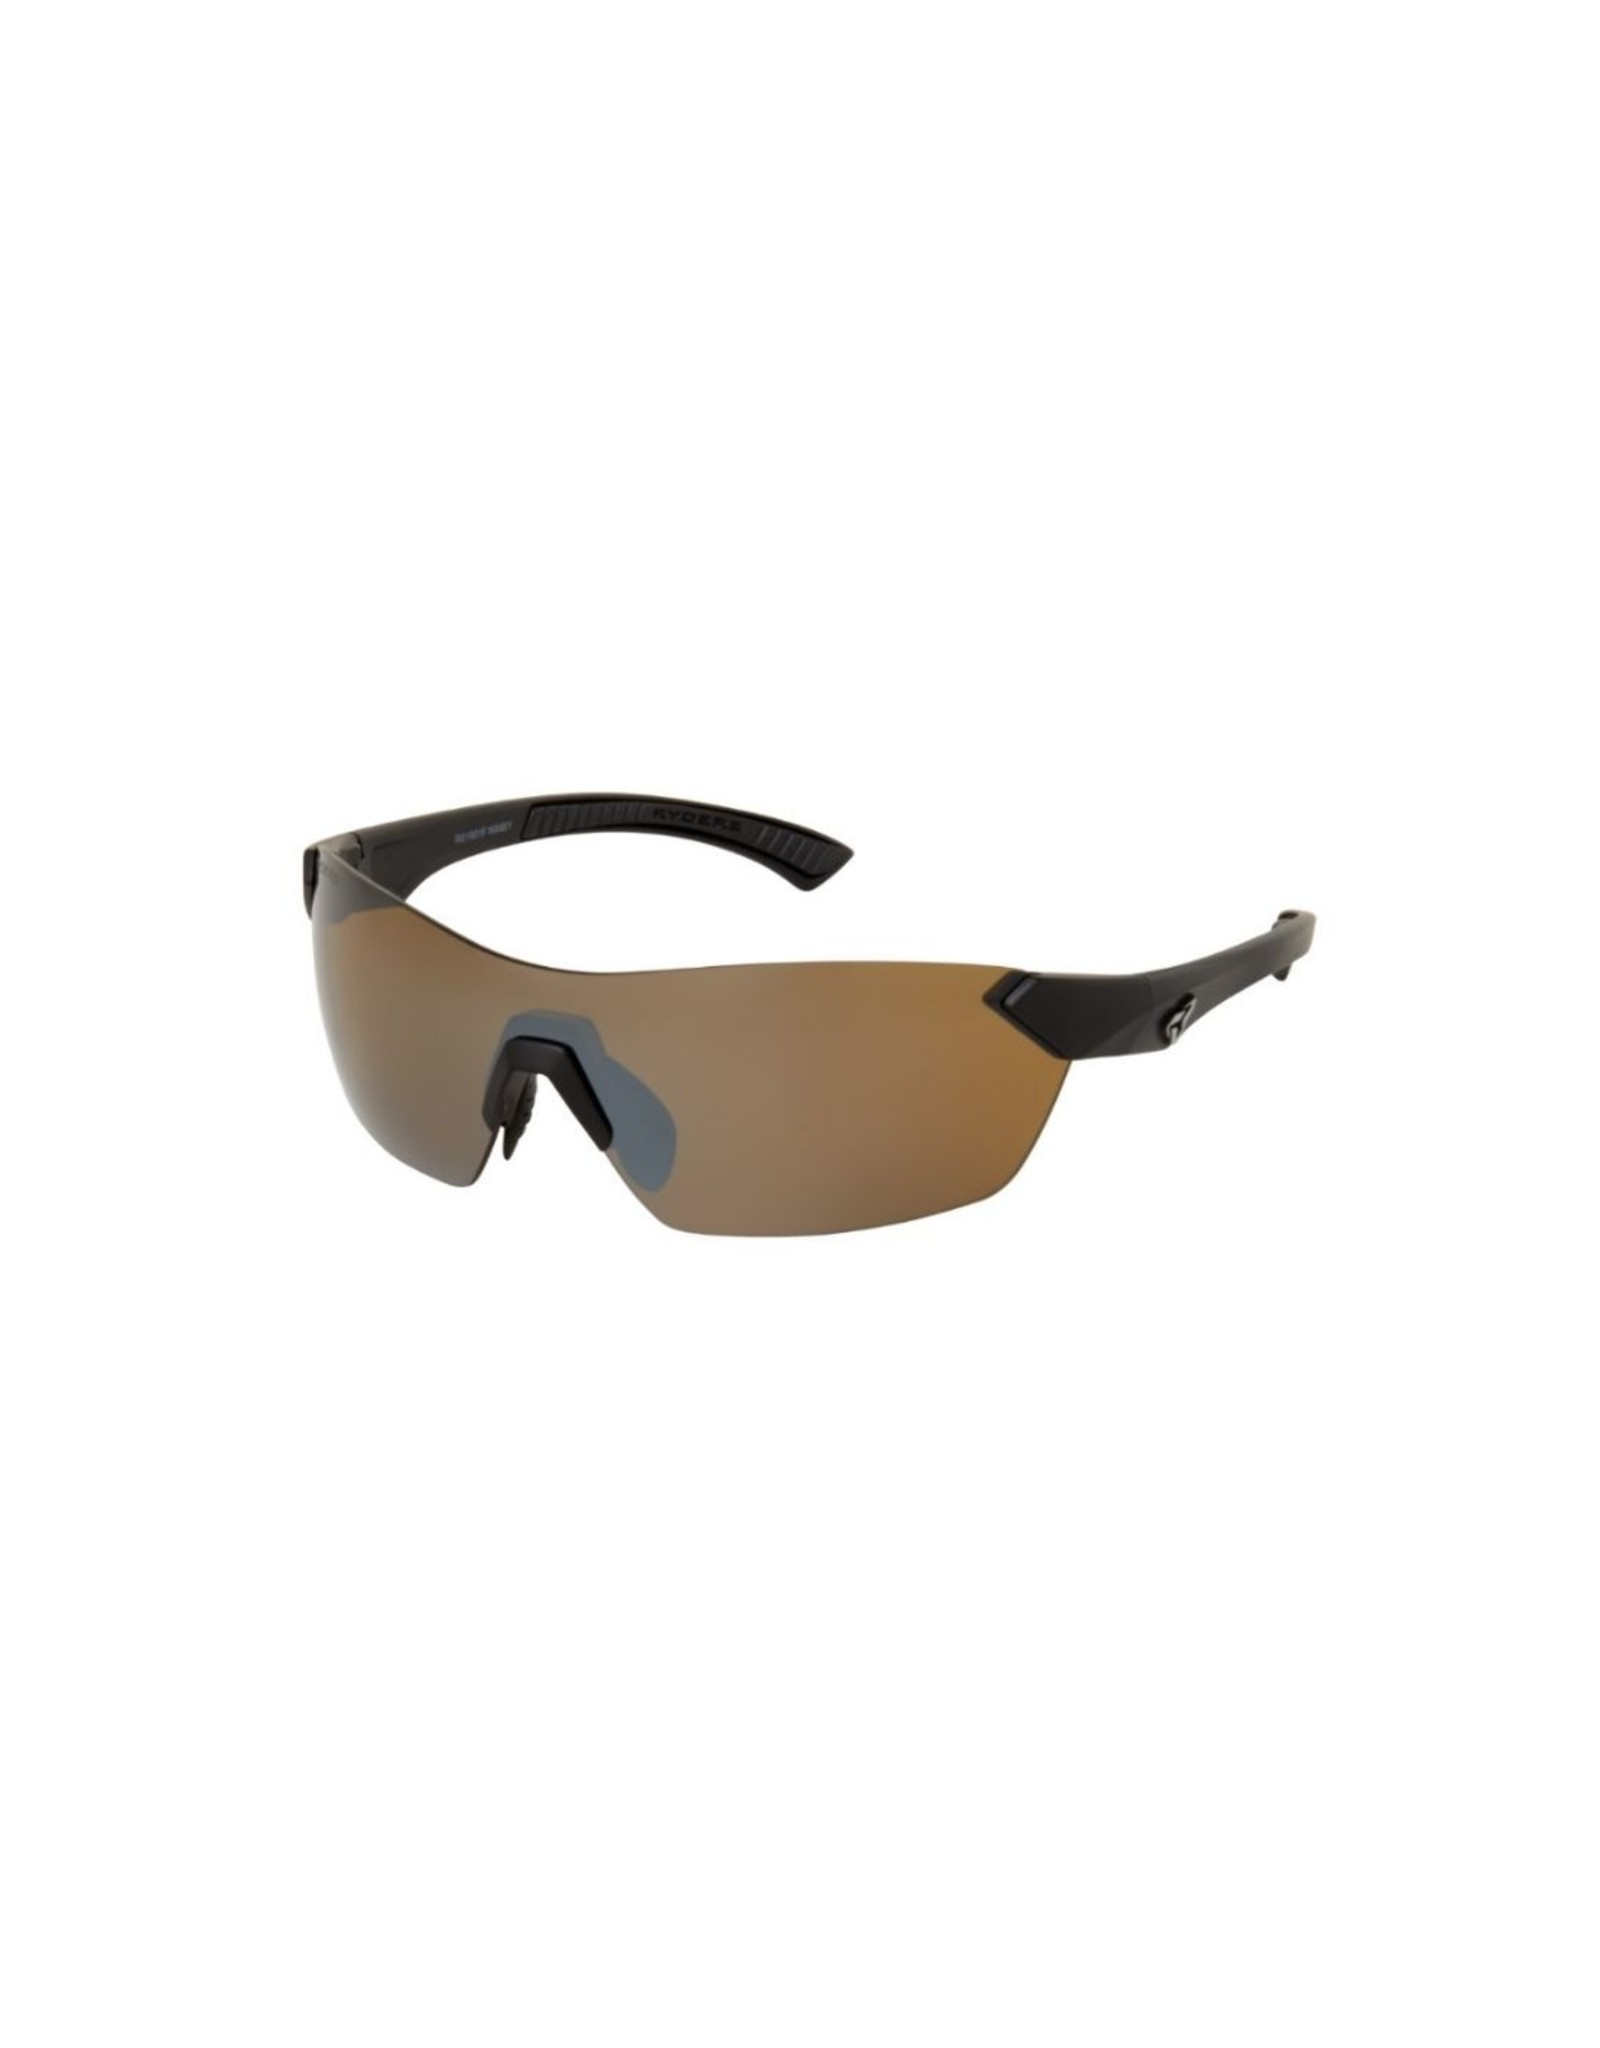 Ryders Eyewear - Nimby Matte Black/Brown Lens Silver FM